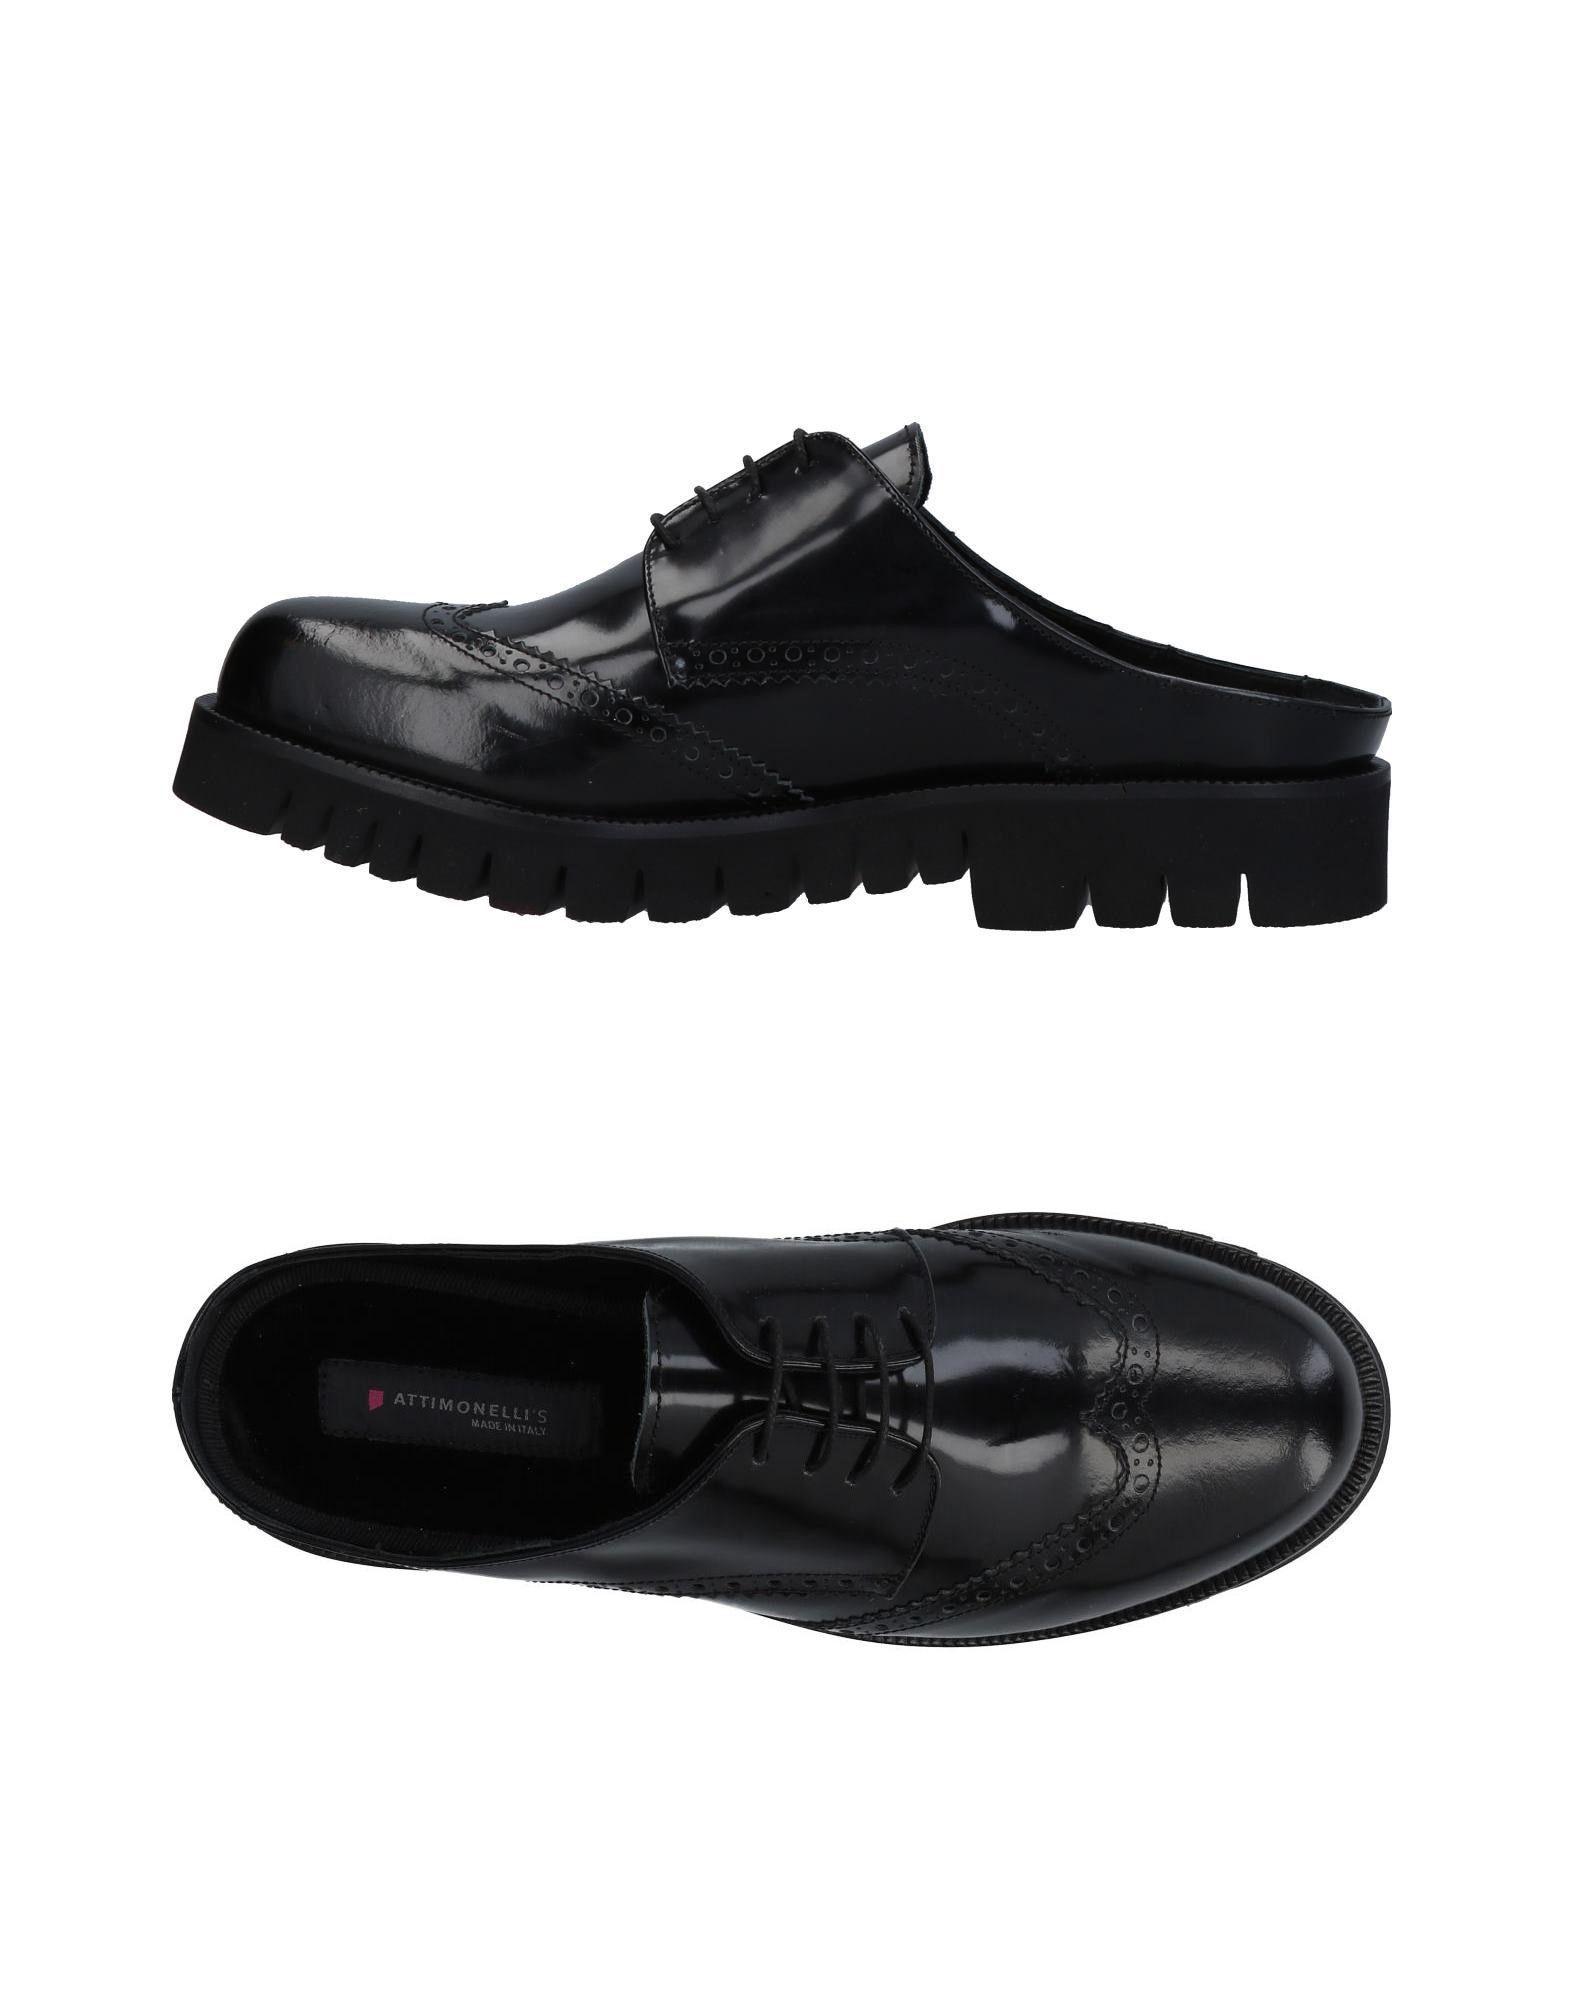 Moda Pantofole Attimonelli's Uomo - 11447961XS